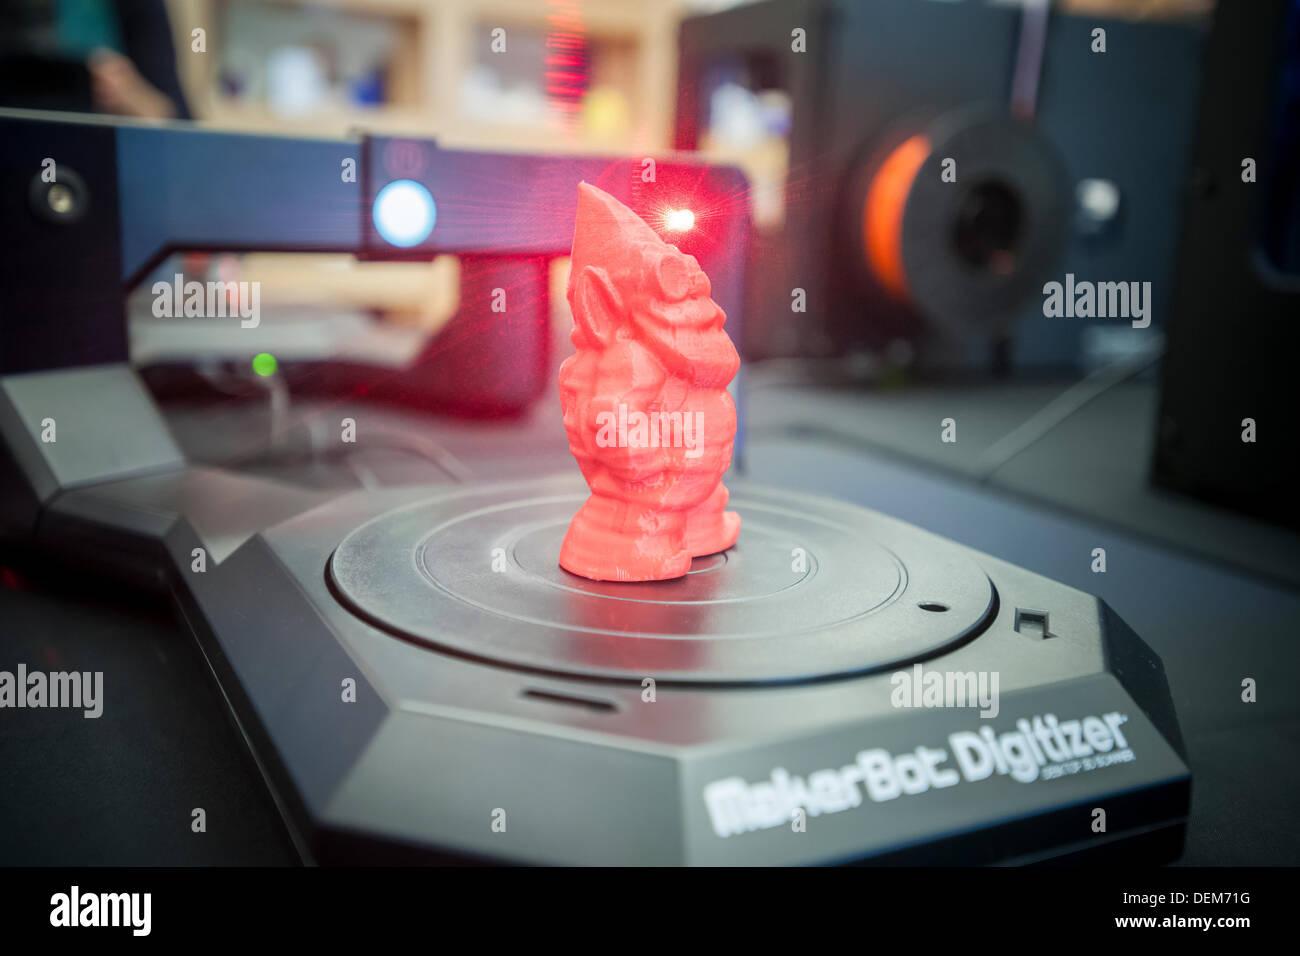 New York, USA. 20th September 2013. A MakerBot Industries MakerBot Digitizer Desktop 3D scanner scans a gnome figure - Stock Image